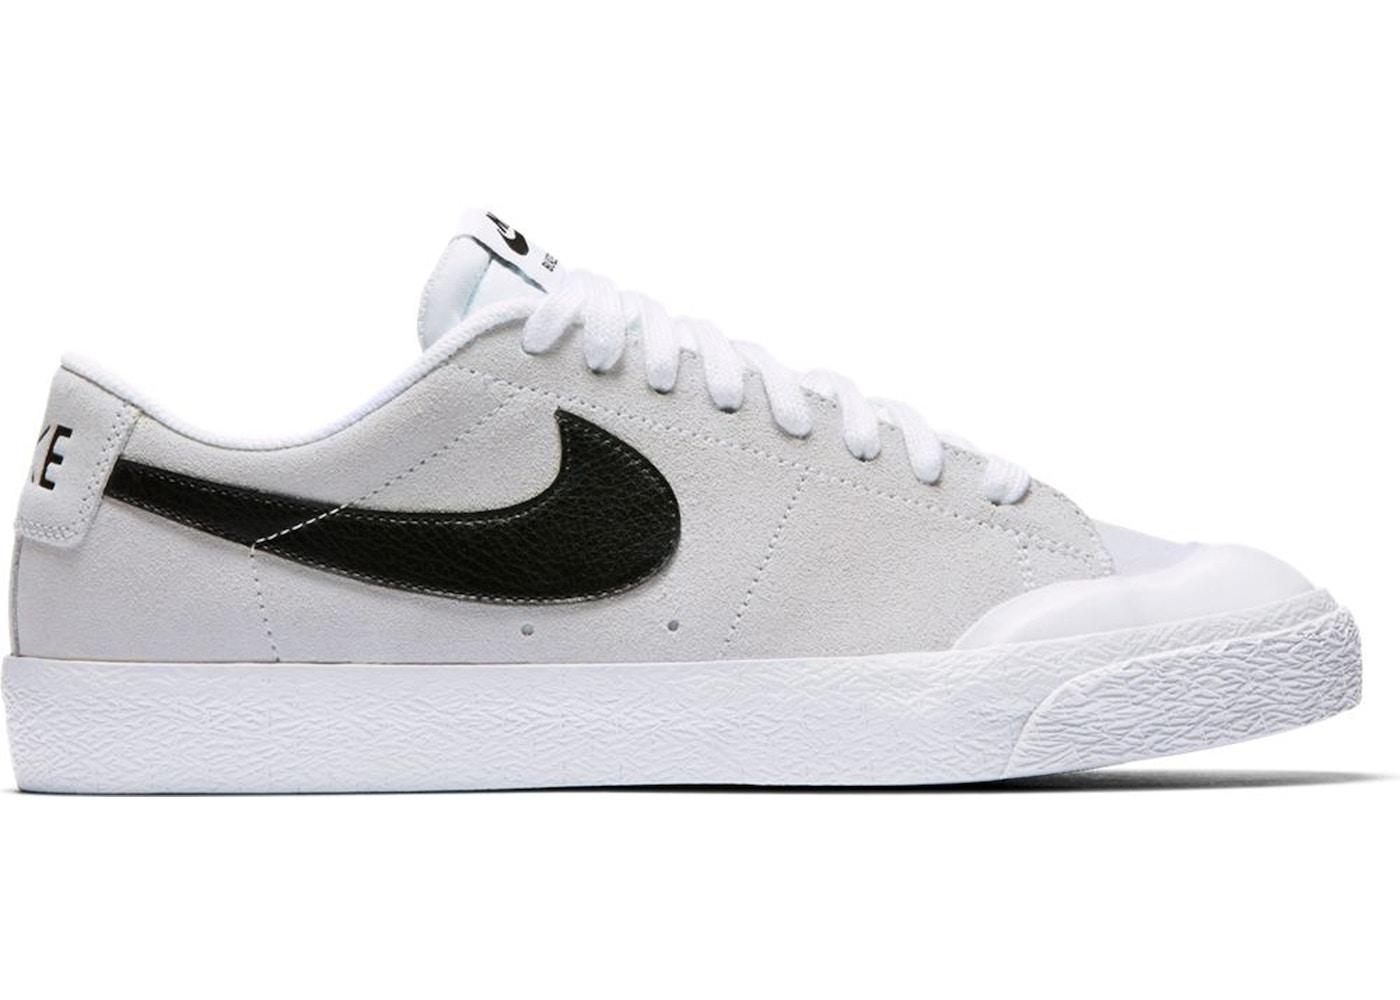 Nike SB Blazer Low Summit White Black - 864348-101